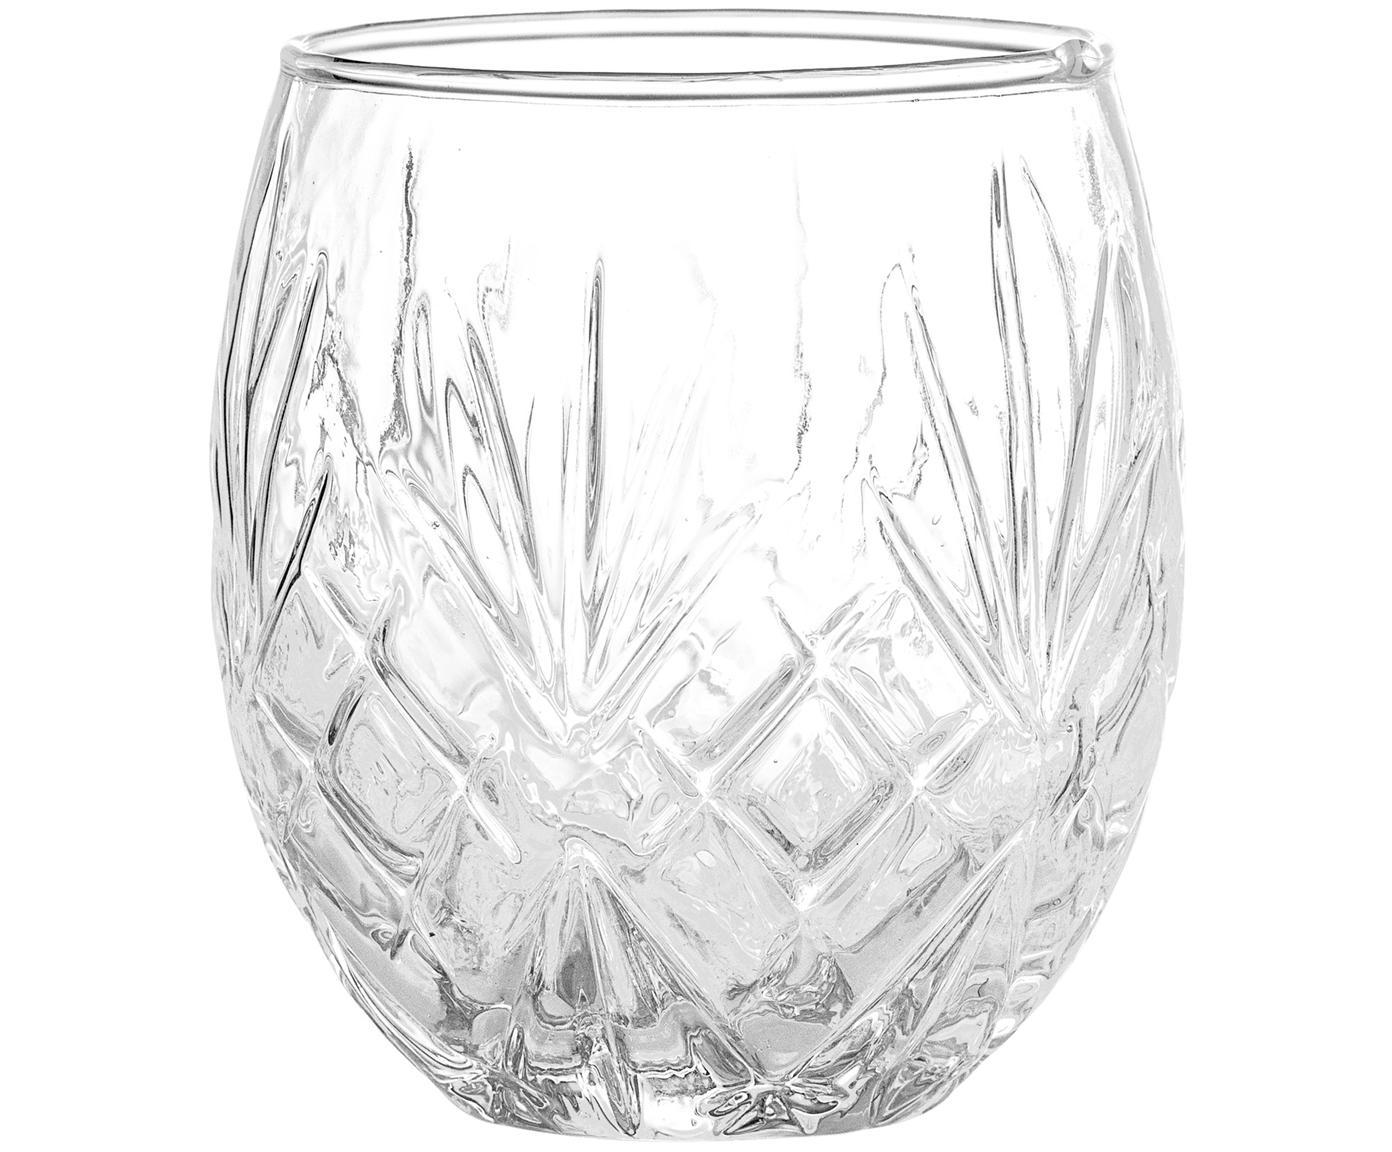 Glas-Zahnputzbecher Alice, Glas, Transparent, Ø 9 x H 10 cm